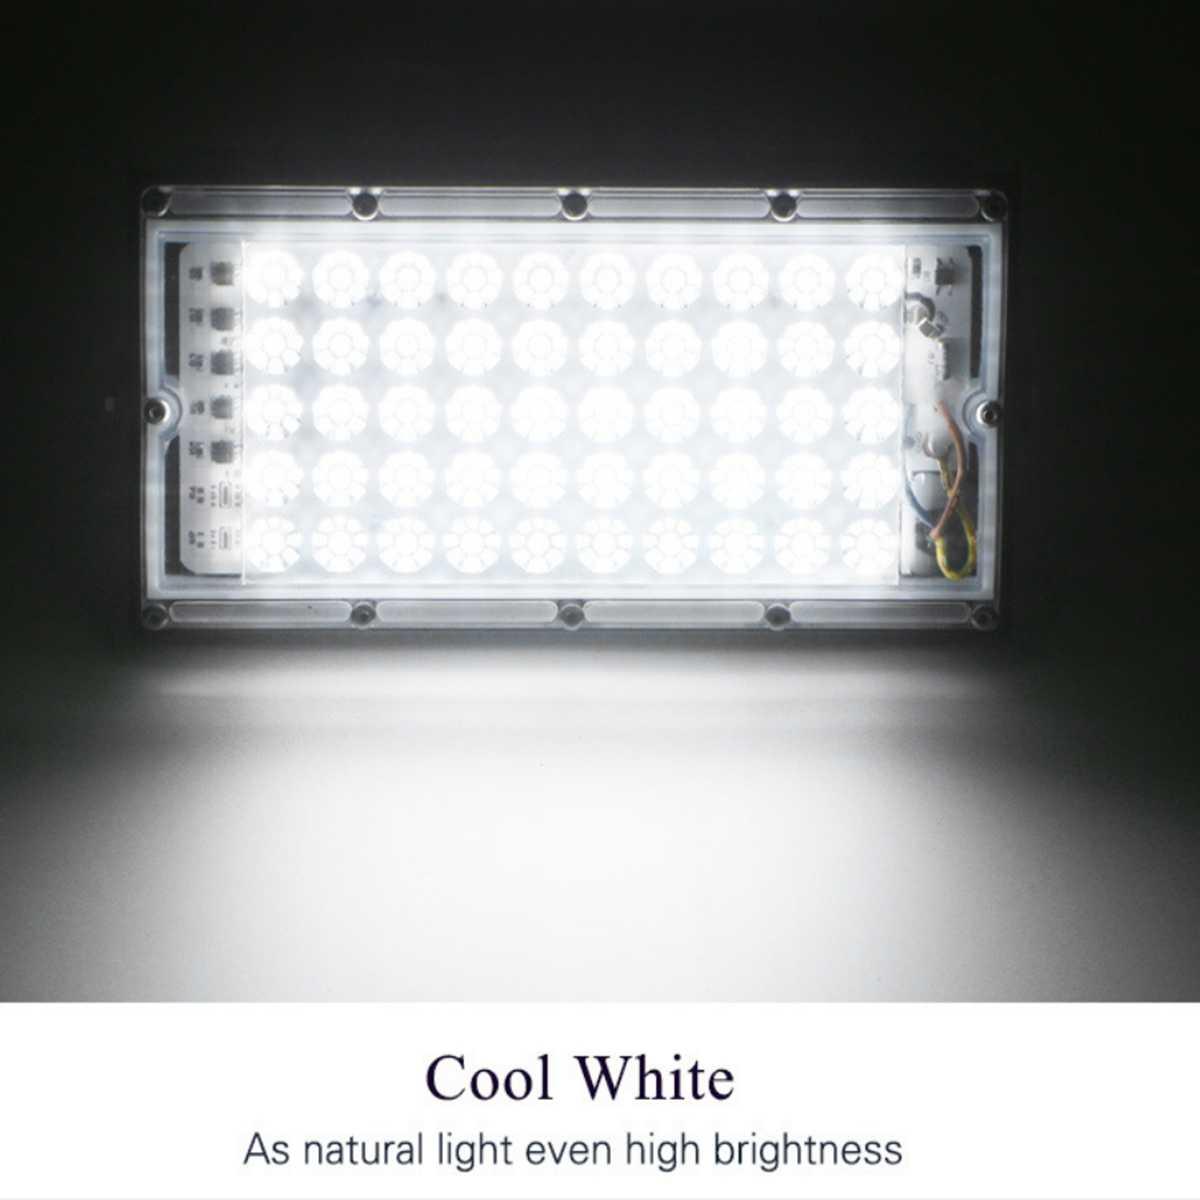 LED 50W UVC Yg Menghapus Kuman Penyakit Lampu Flood Light 110V 220V Lampu Sorot Outdoor Taman Dinding Lampu Jalan LED reflektor Cahaya Dilemparkan